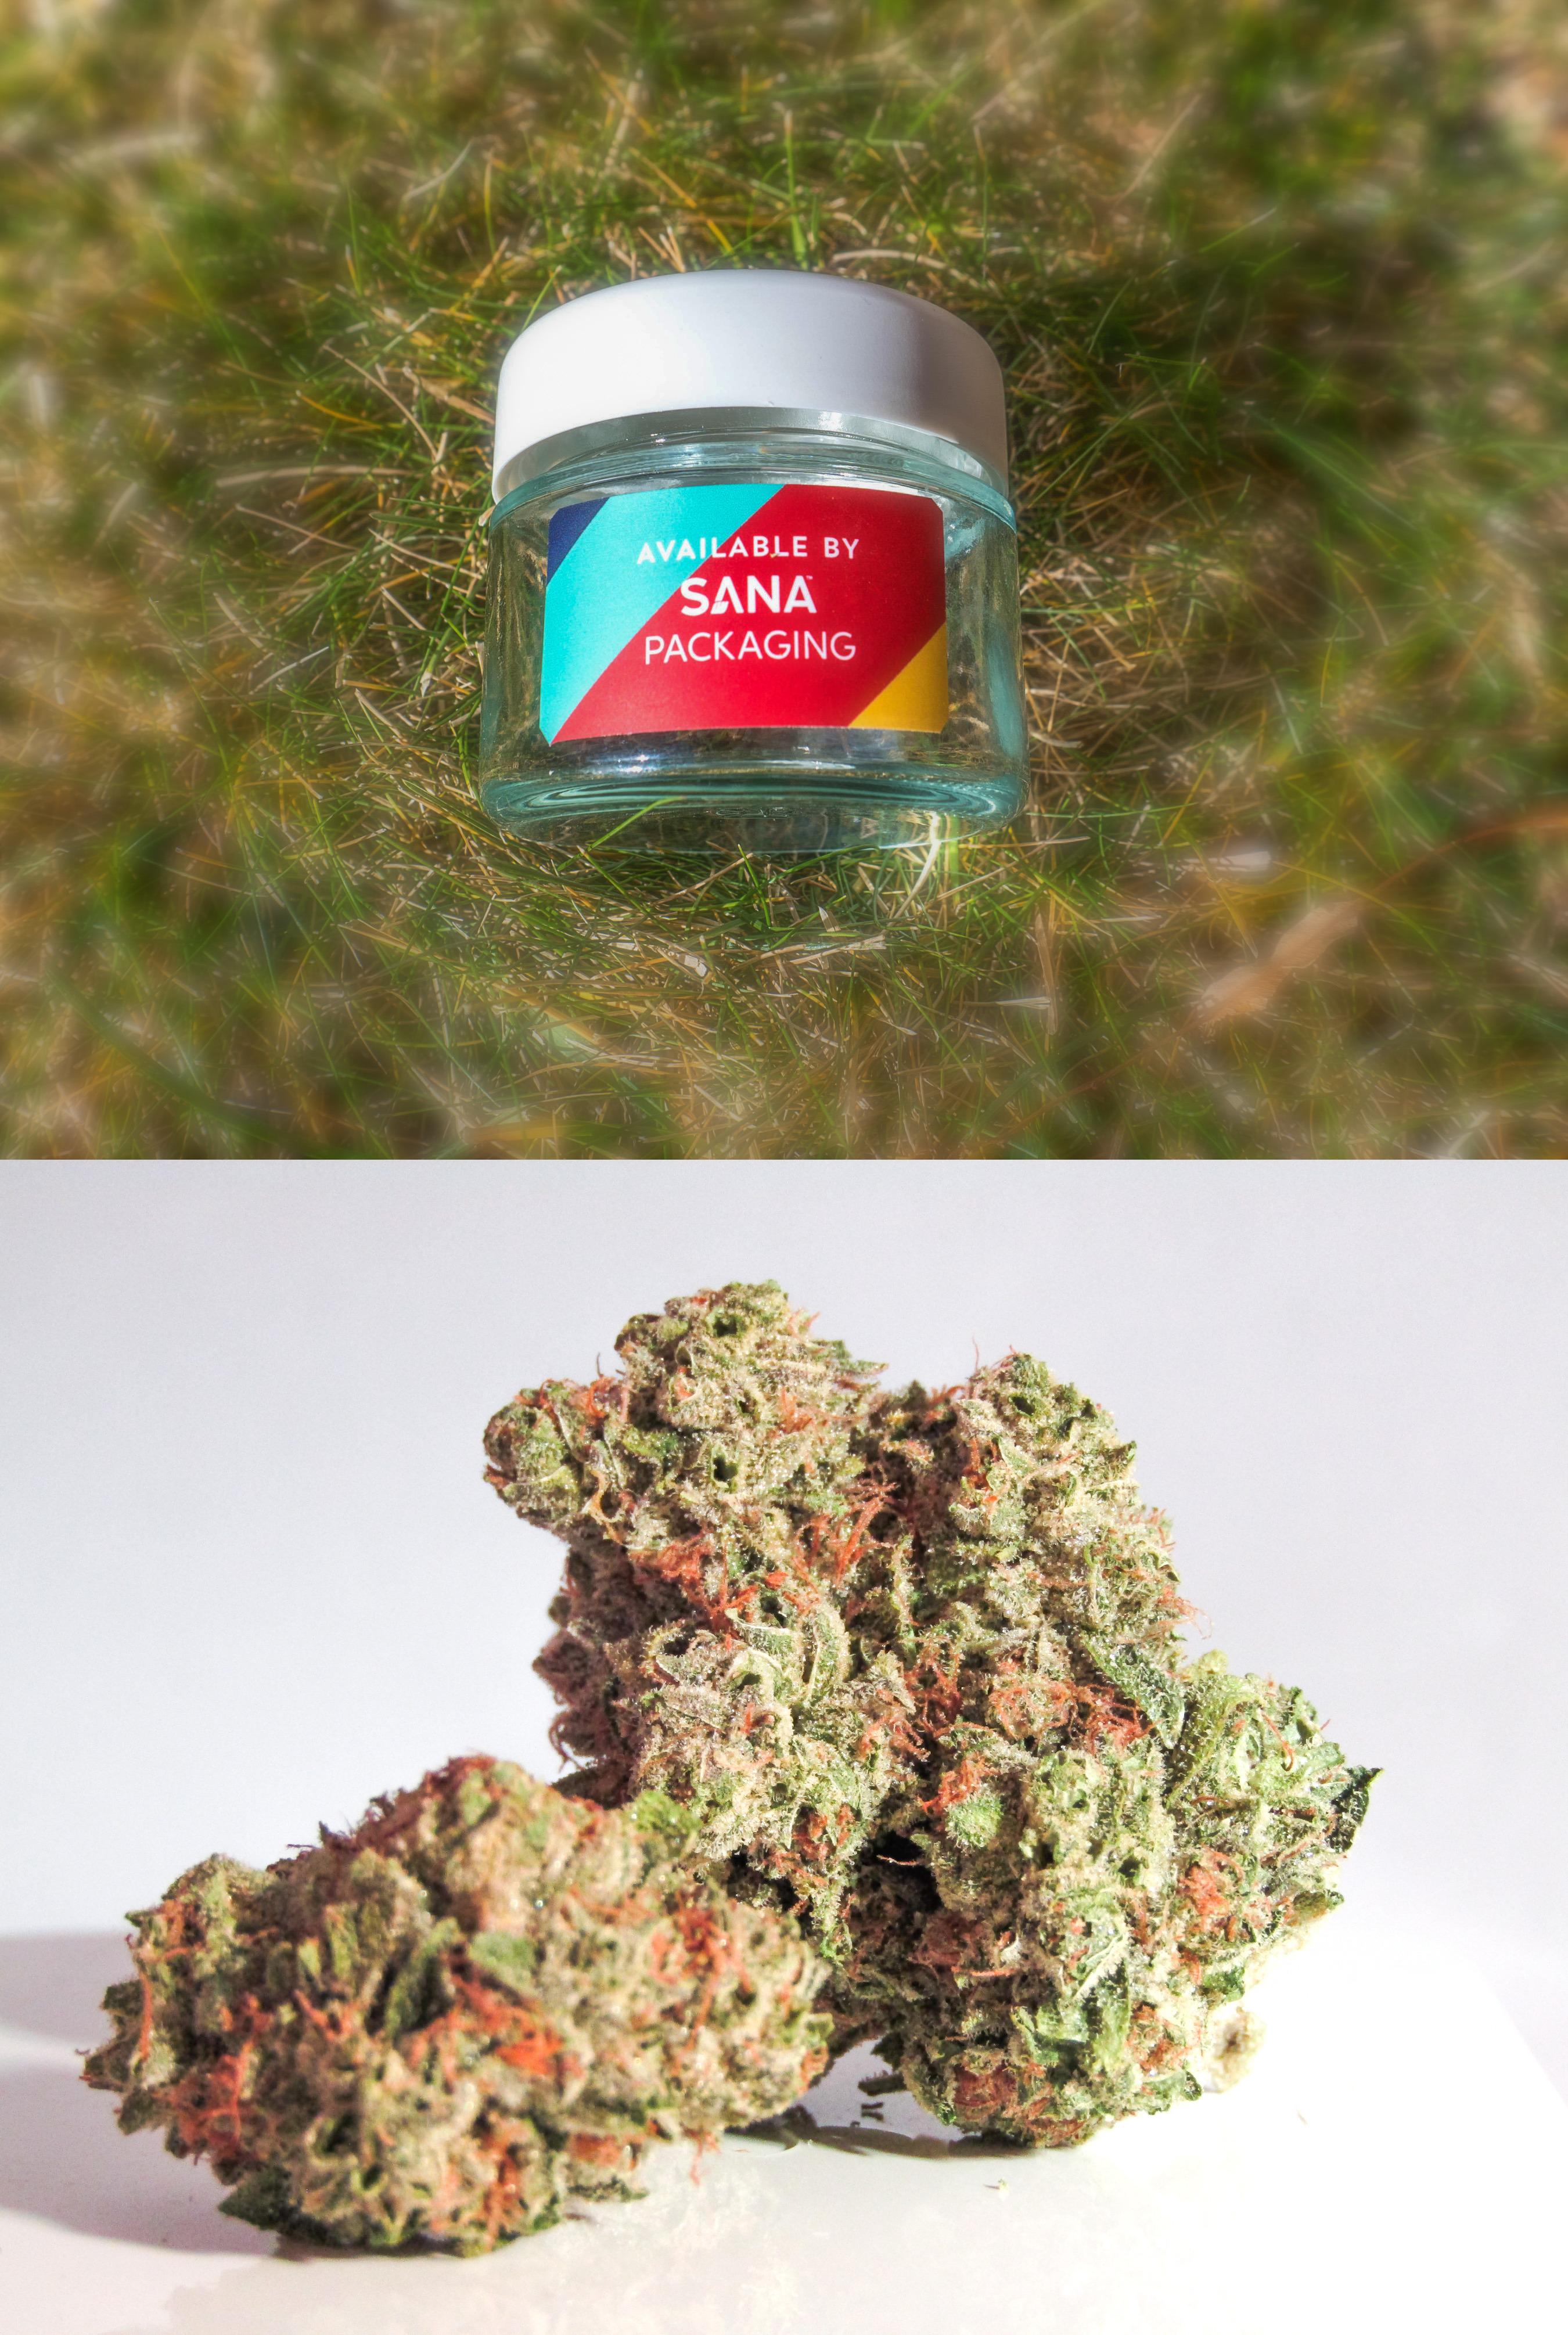 (Top) The Sana Ocean Screw-Top lid and glass jar. (Bottom) Marijuana bud.